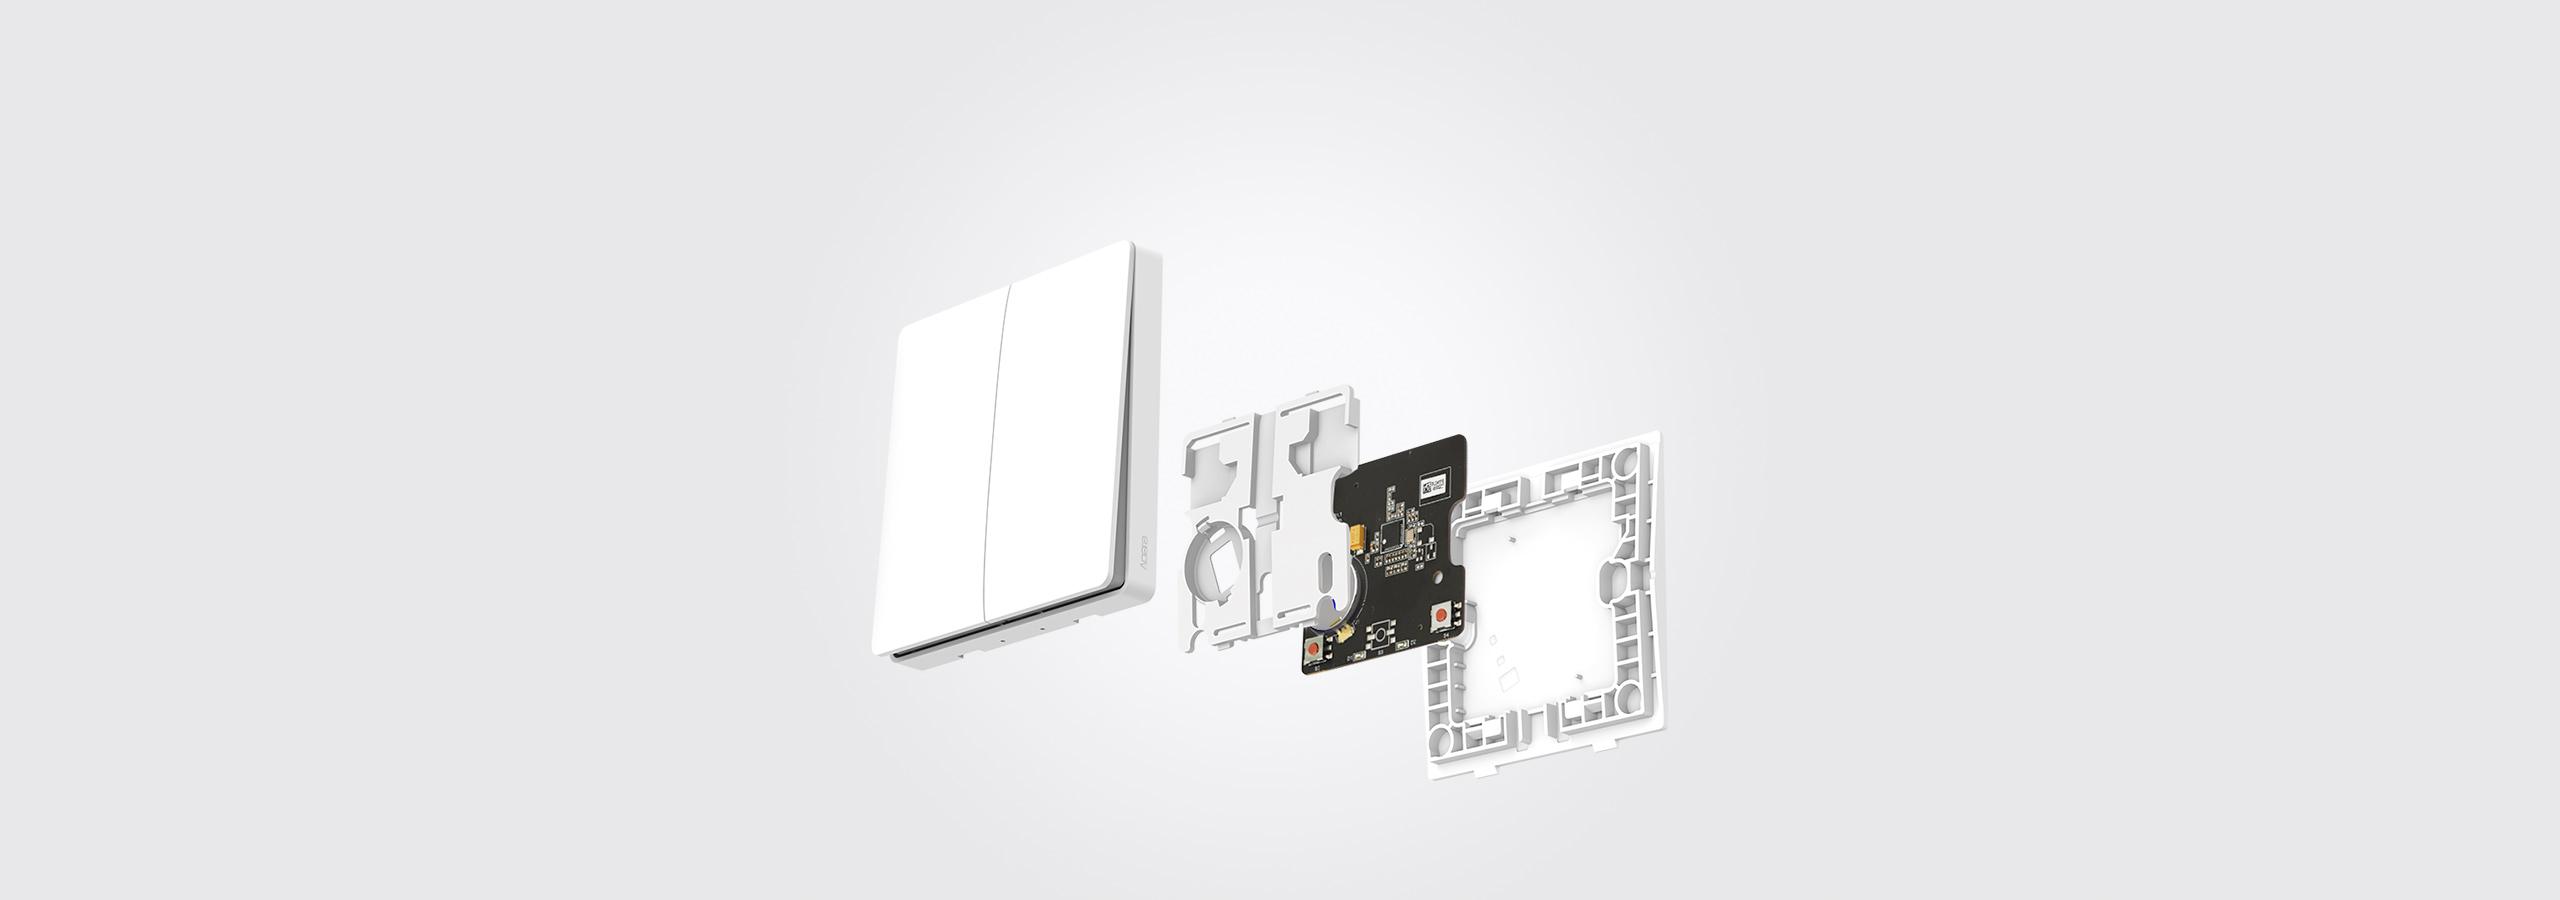 Aqara wireless light switch internal details